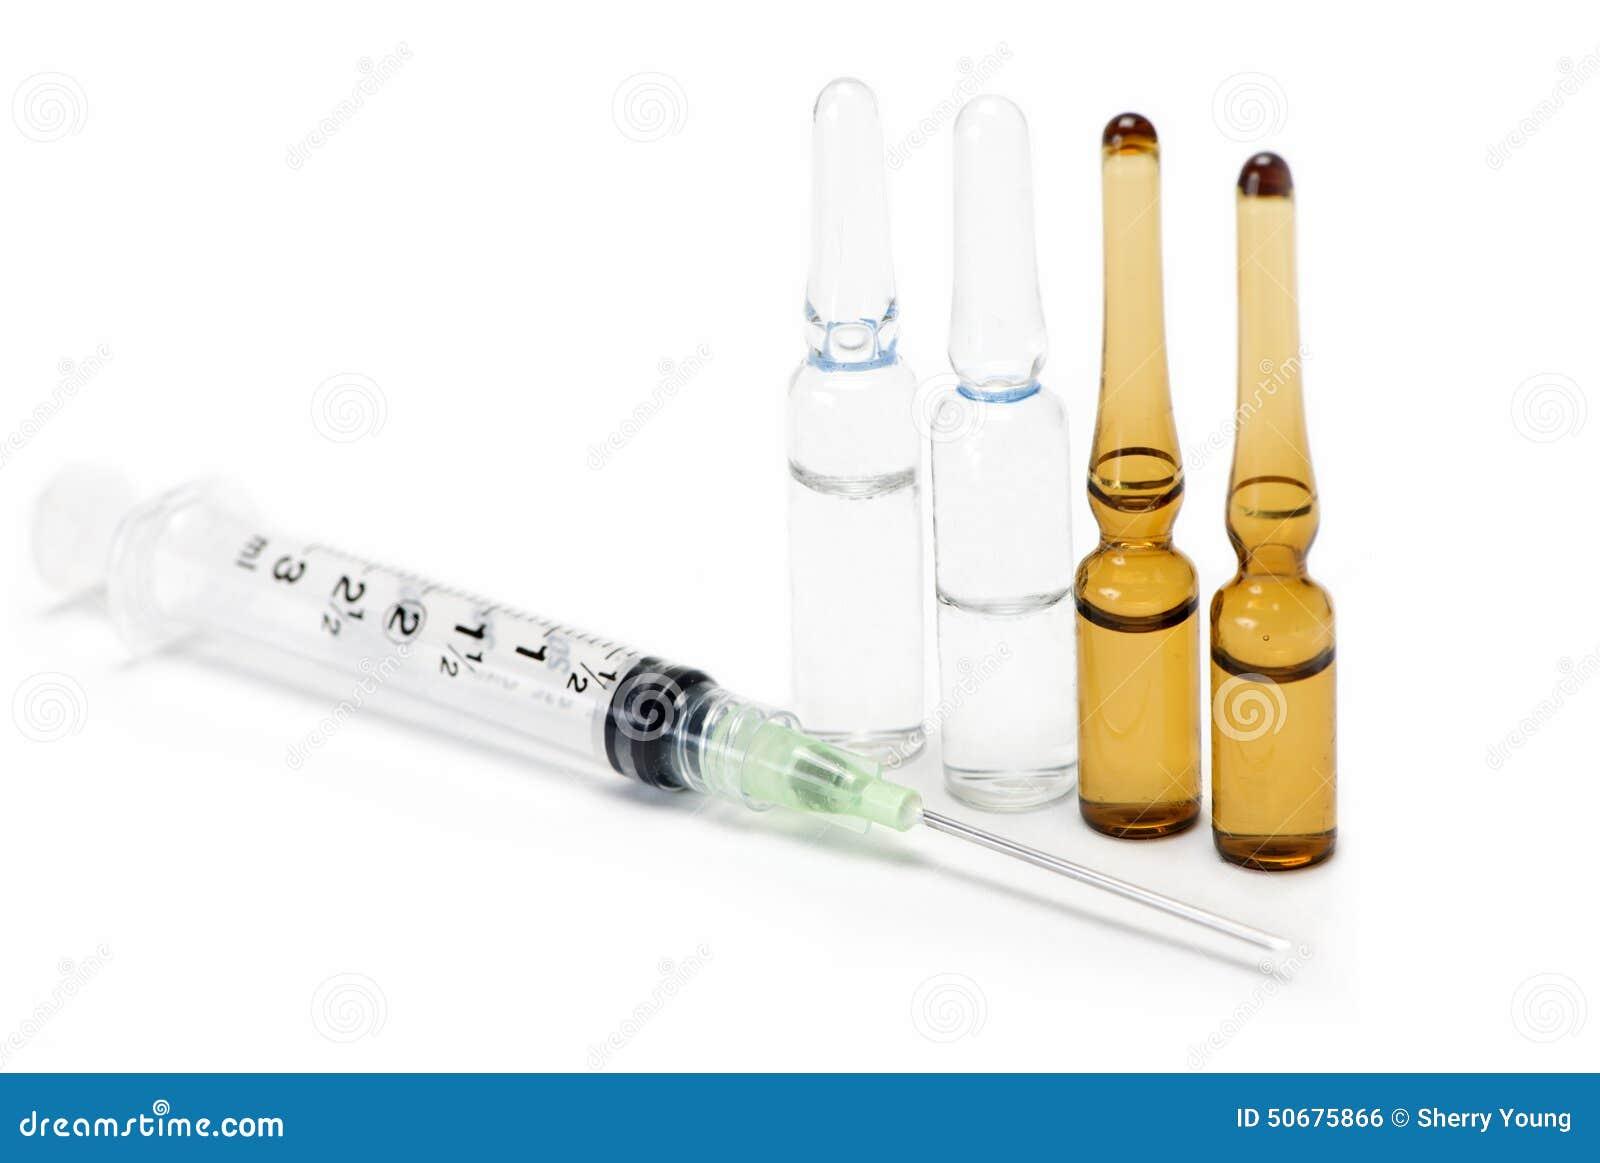 Download 过滤器一次用量的针剂 库存照片. 图片 包括有 类固醇, multivitamin, 治疗, 疫苗, 医疗 - 50675866